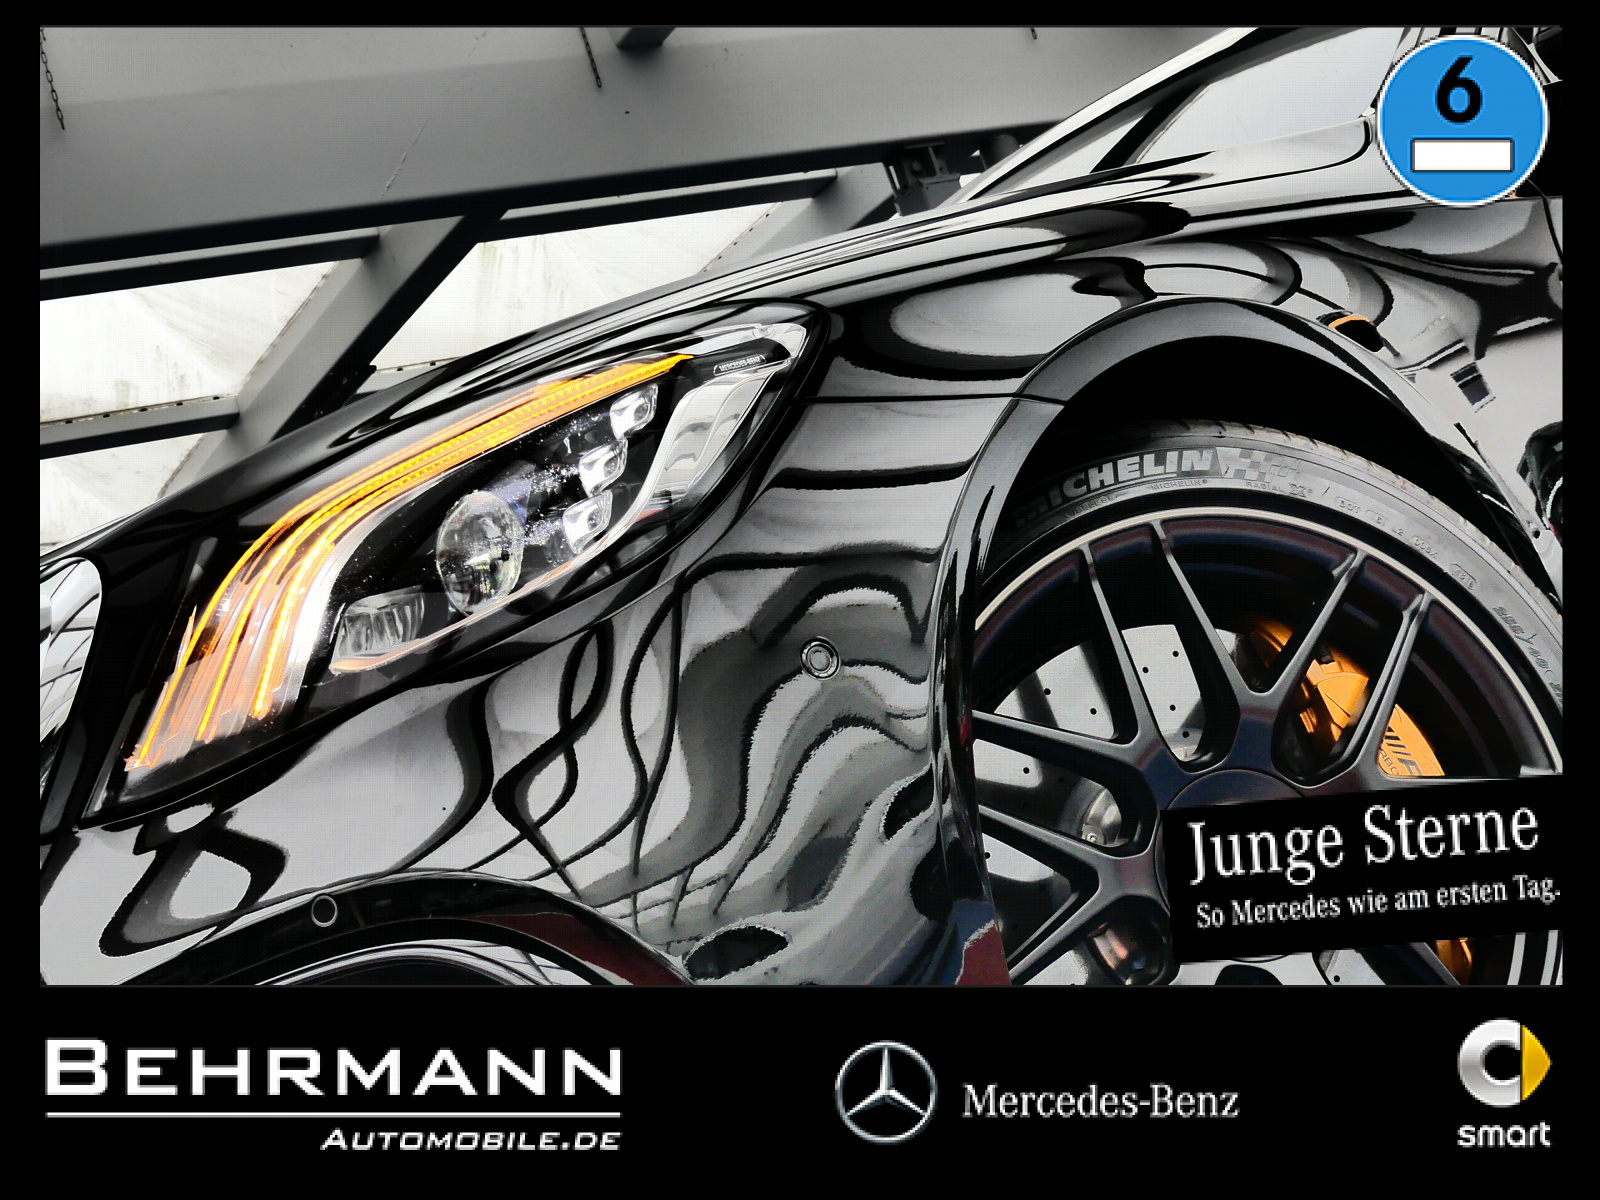 Mercedes-Benz S 63 AMG 4M lang ++Distronic+Vmax+Burmester+LED+, Jahr 2018, Benzin